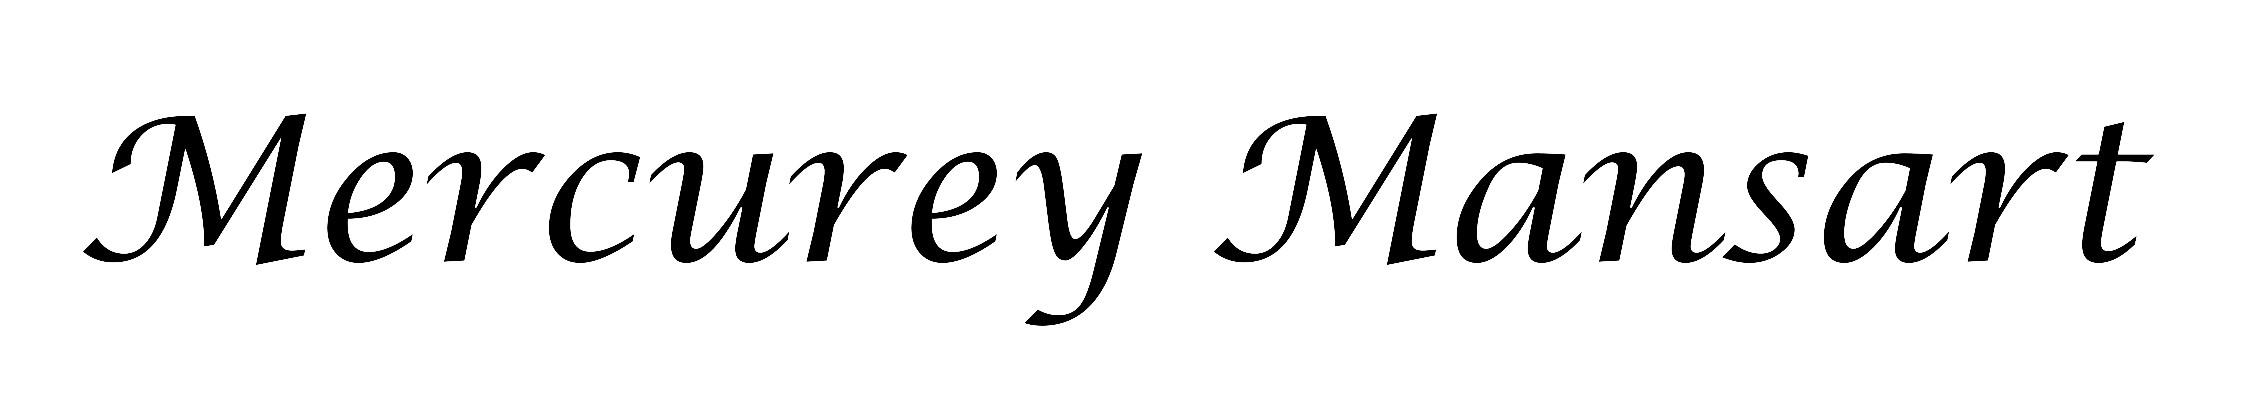 MERCUREY MANSART